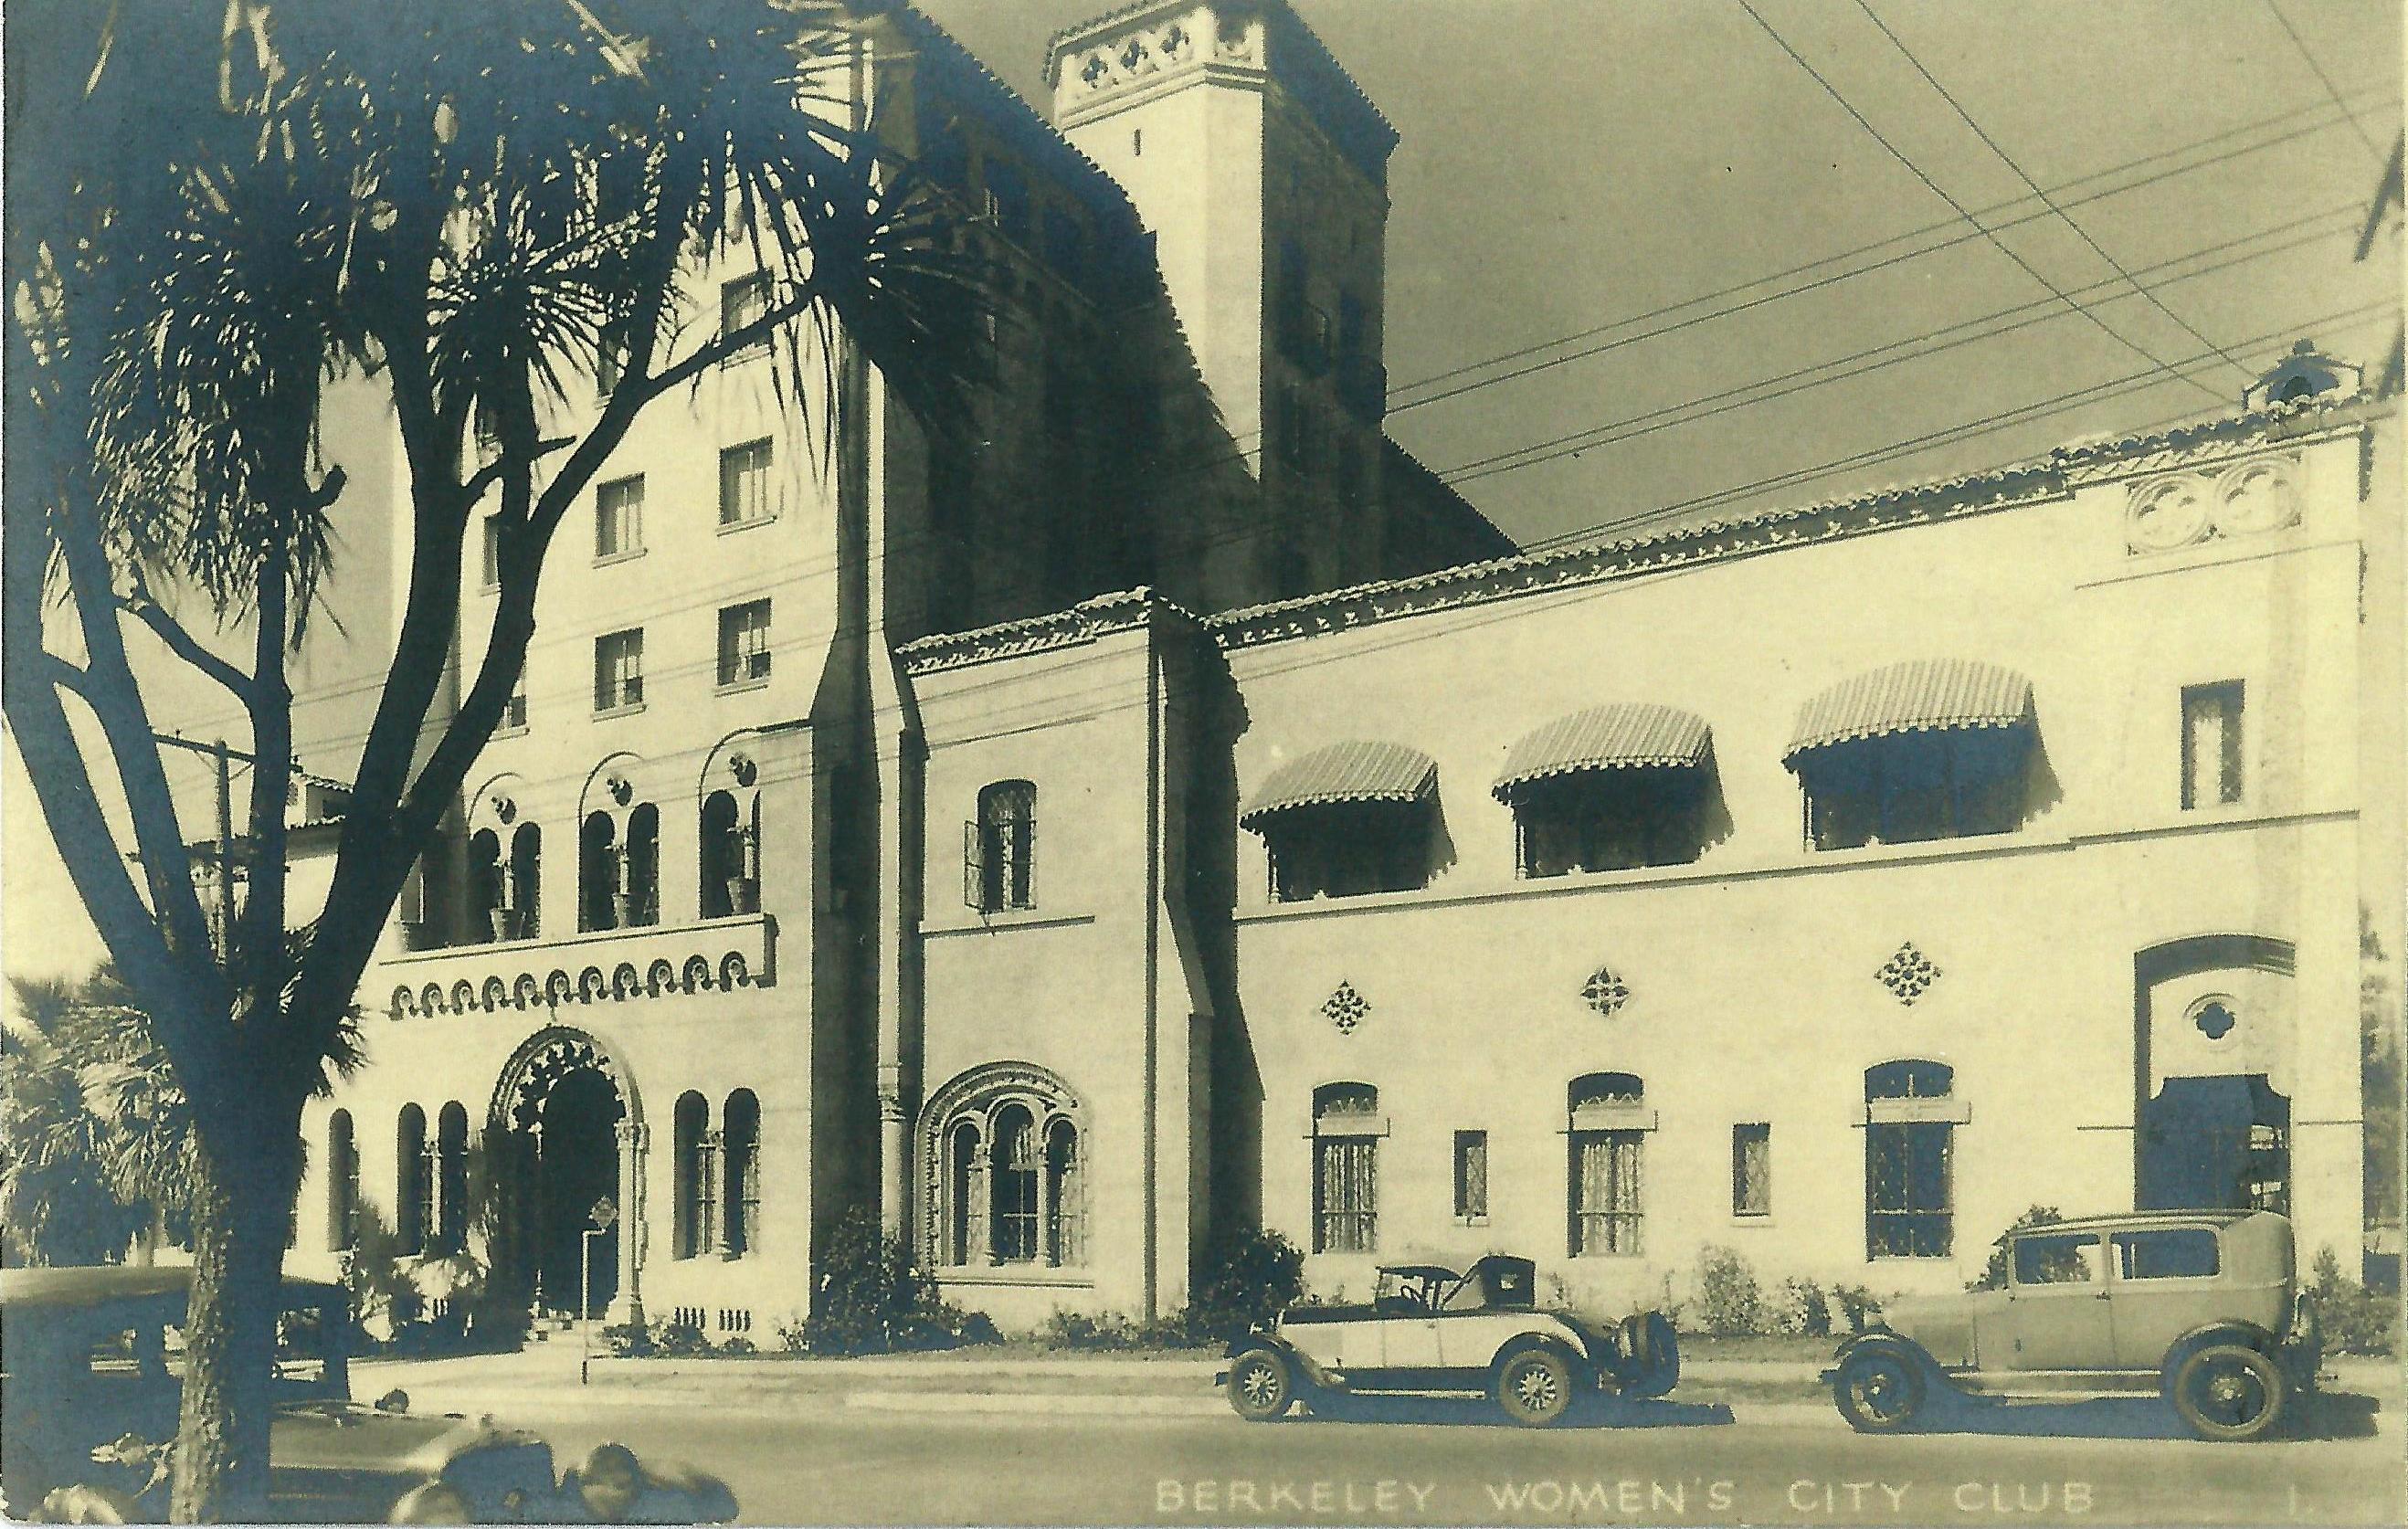 berkeley historical plaque project – morgan, julia – architect